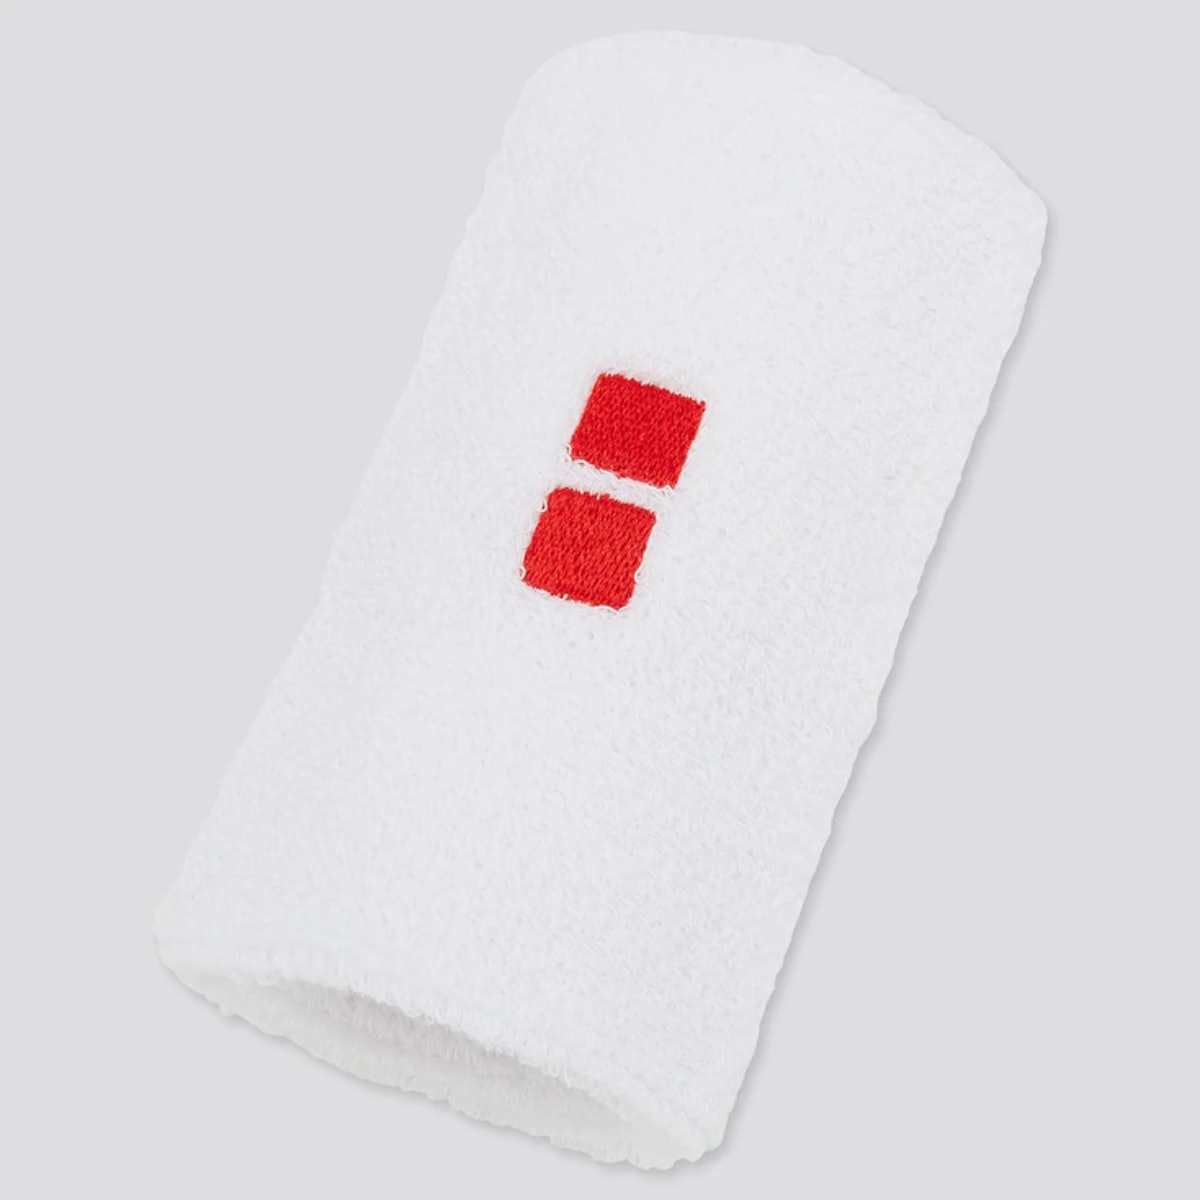 Uniqlo white tennis wristband